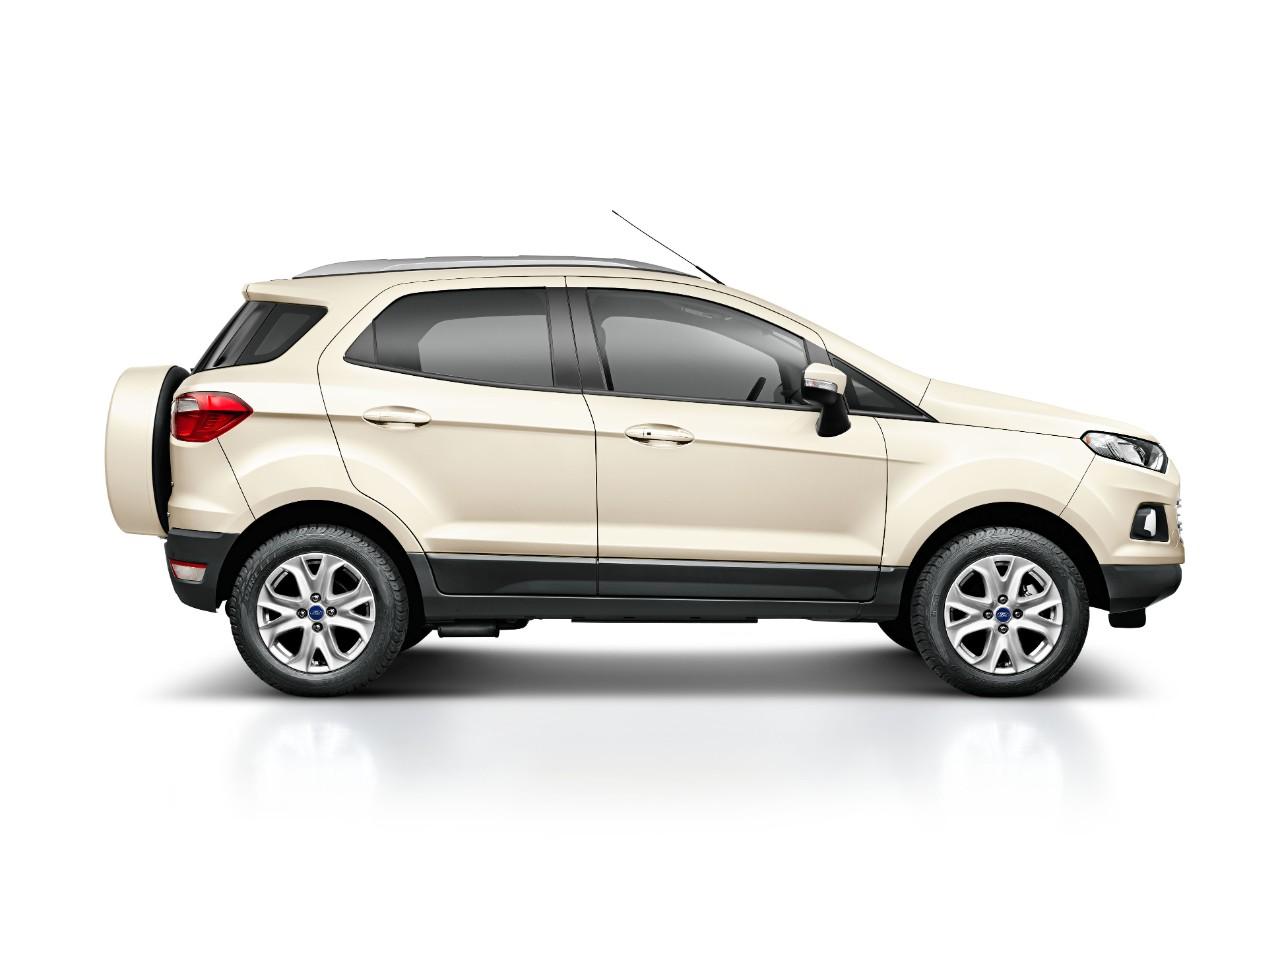 Image Result For Ford Ecosport Spec